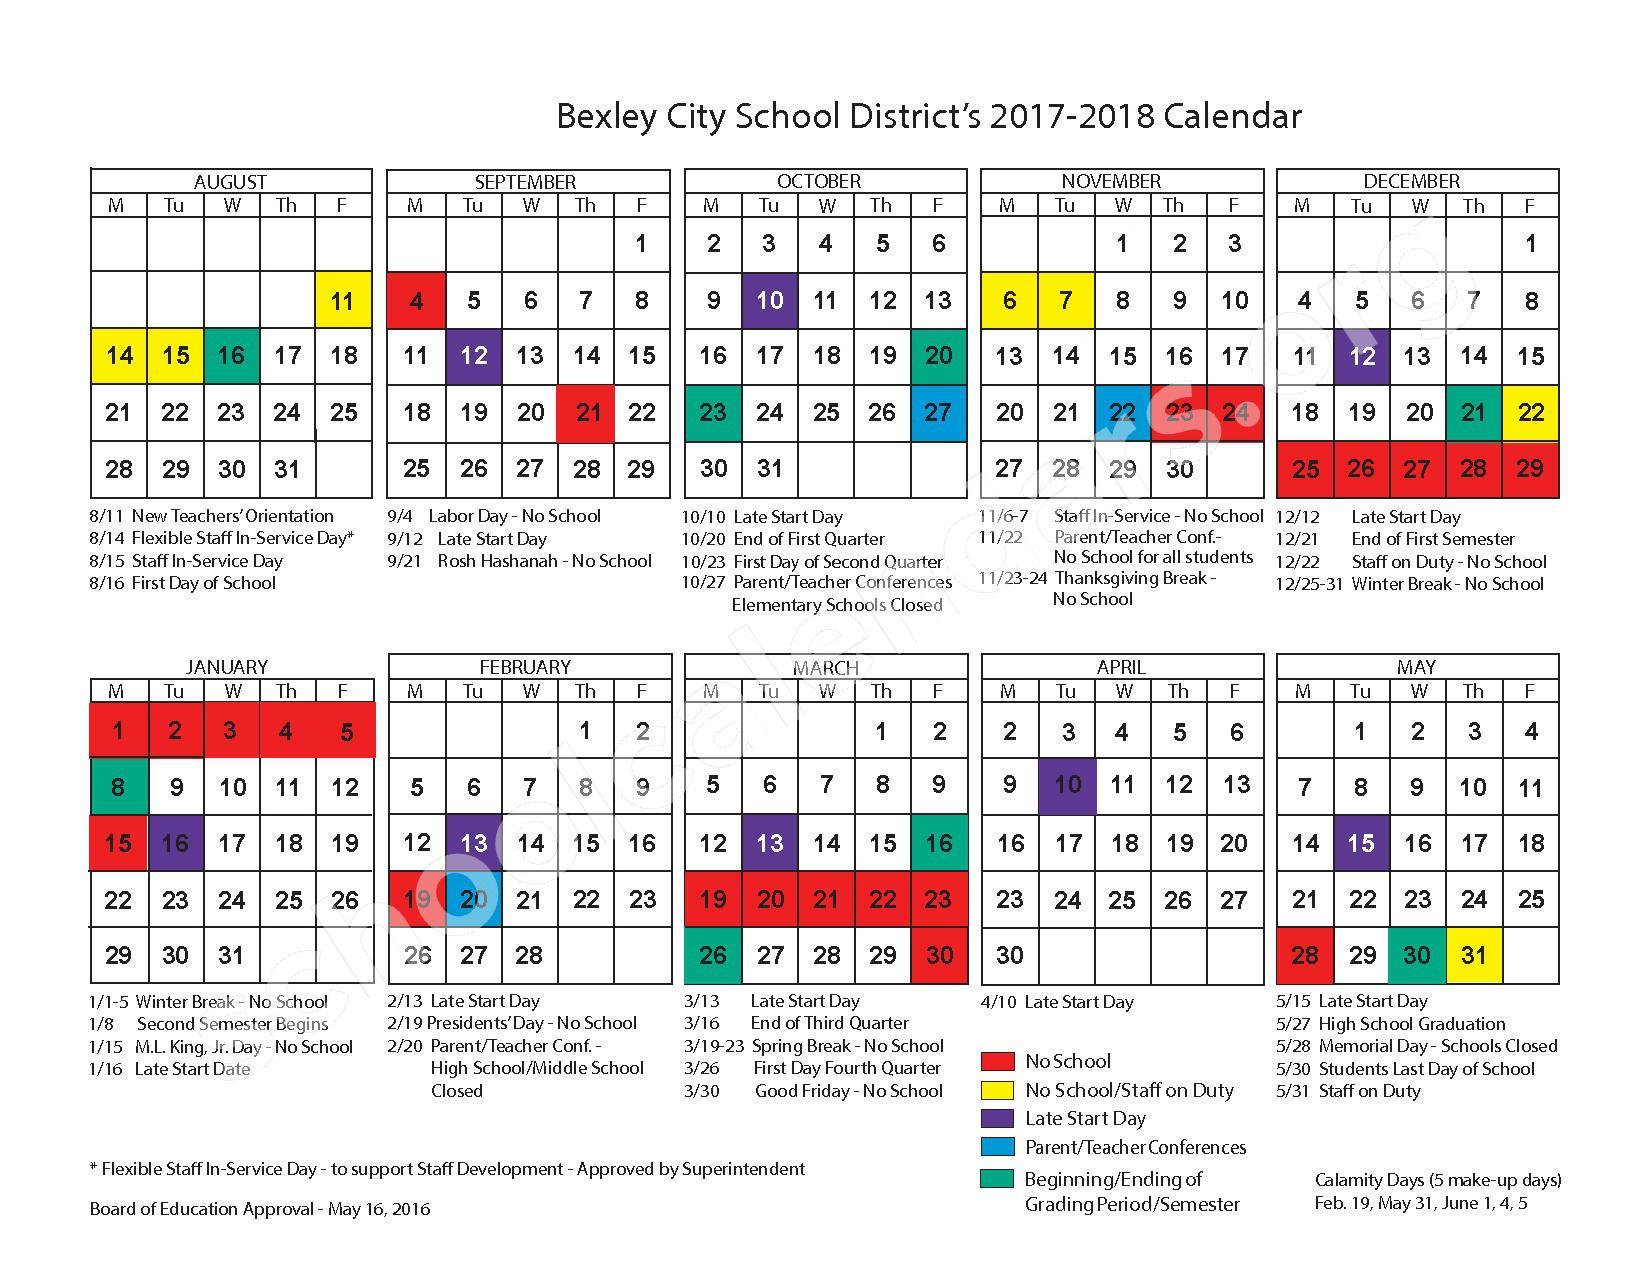 2017 - 2018 District Calendar – Bexley City School District – page 1